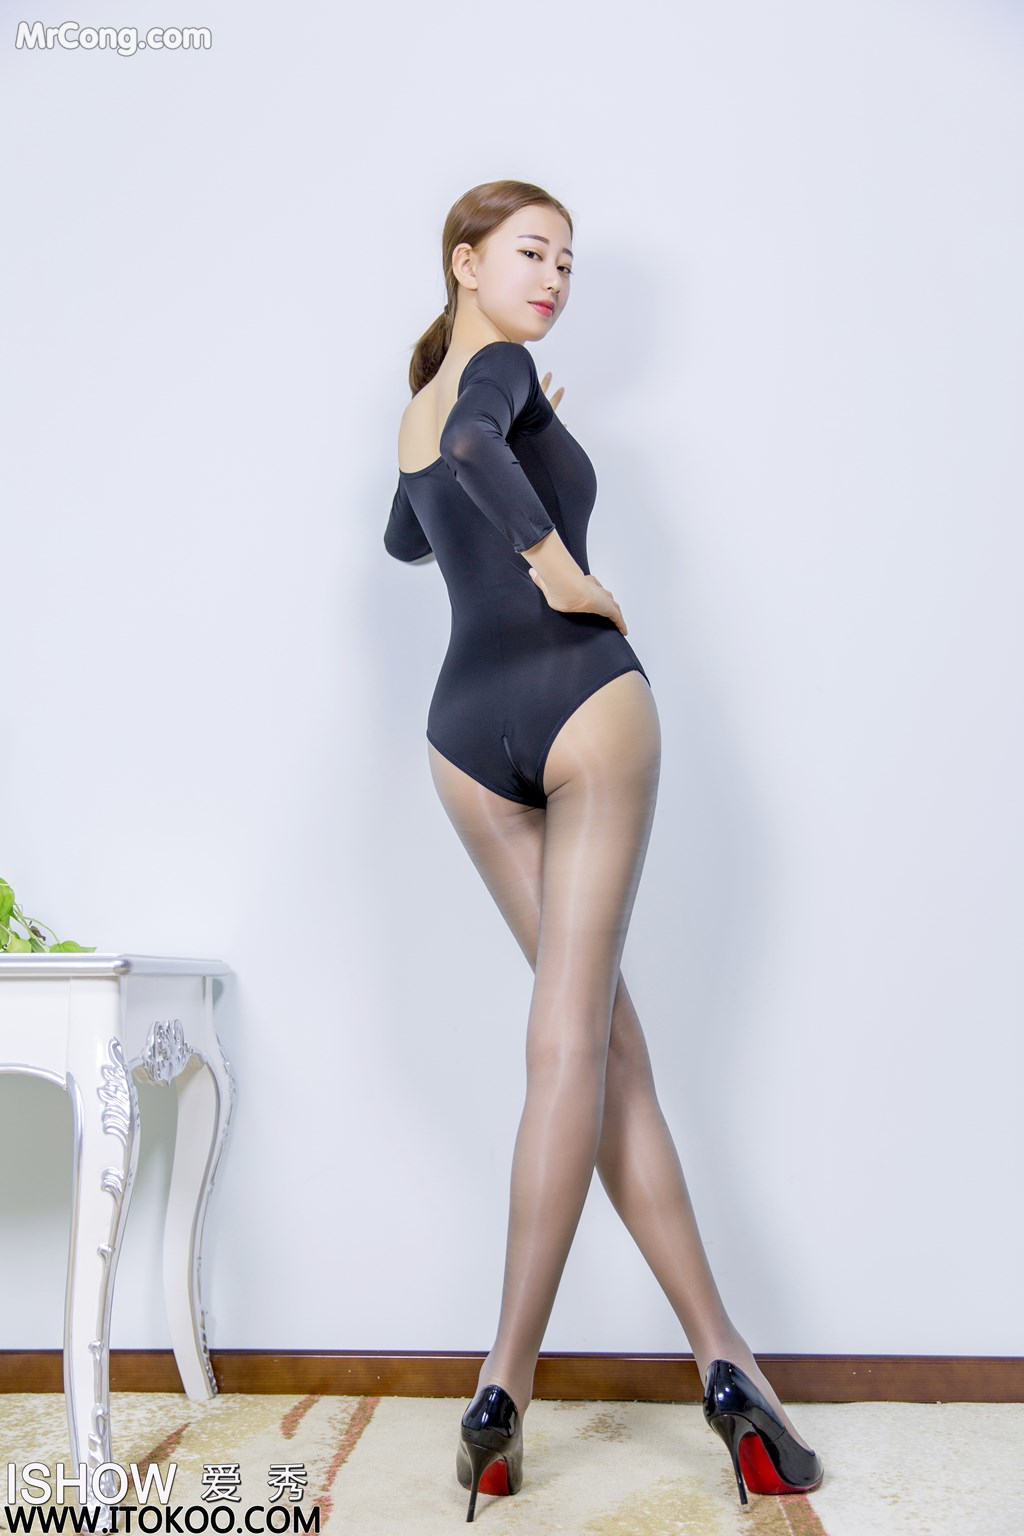 Image ISHOW-No.151-Han-Zhi-Ying-Flora-MrCong.com-008 in post ISHOW No.151: Người mẫu Han Zhi Ying (寒栀樱Flora) (31 ảnh)